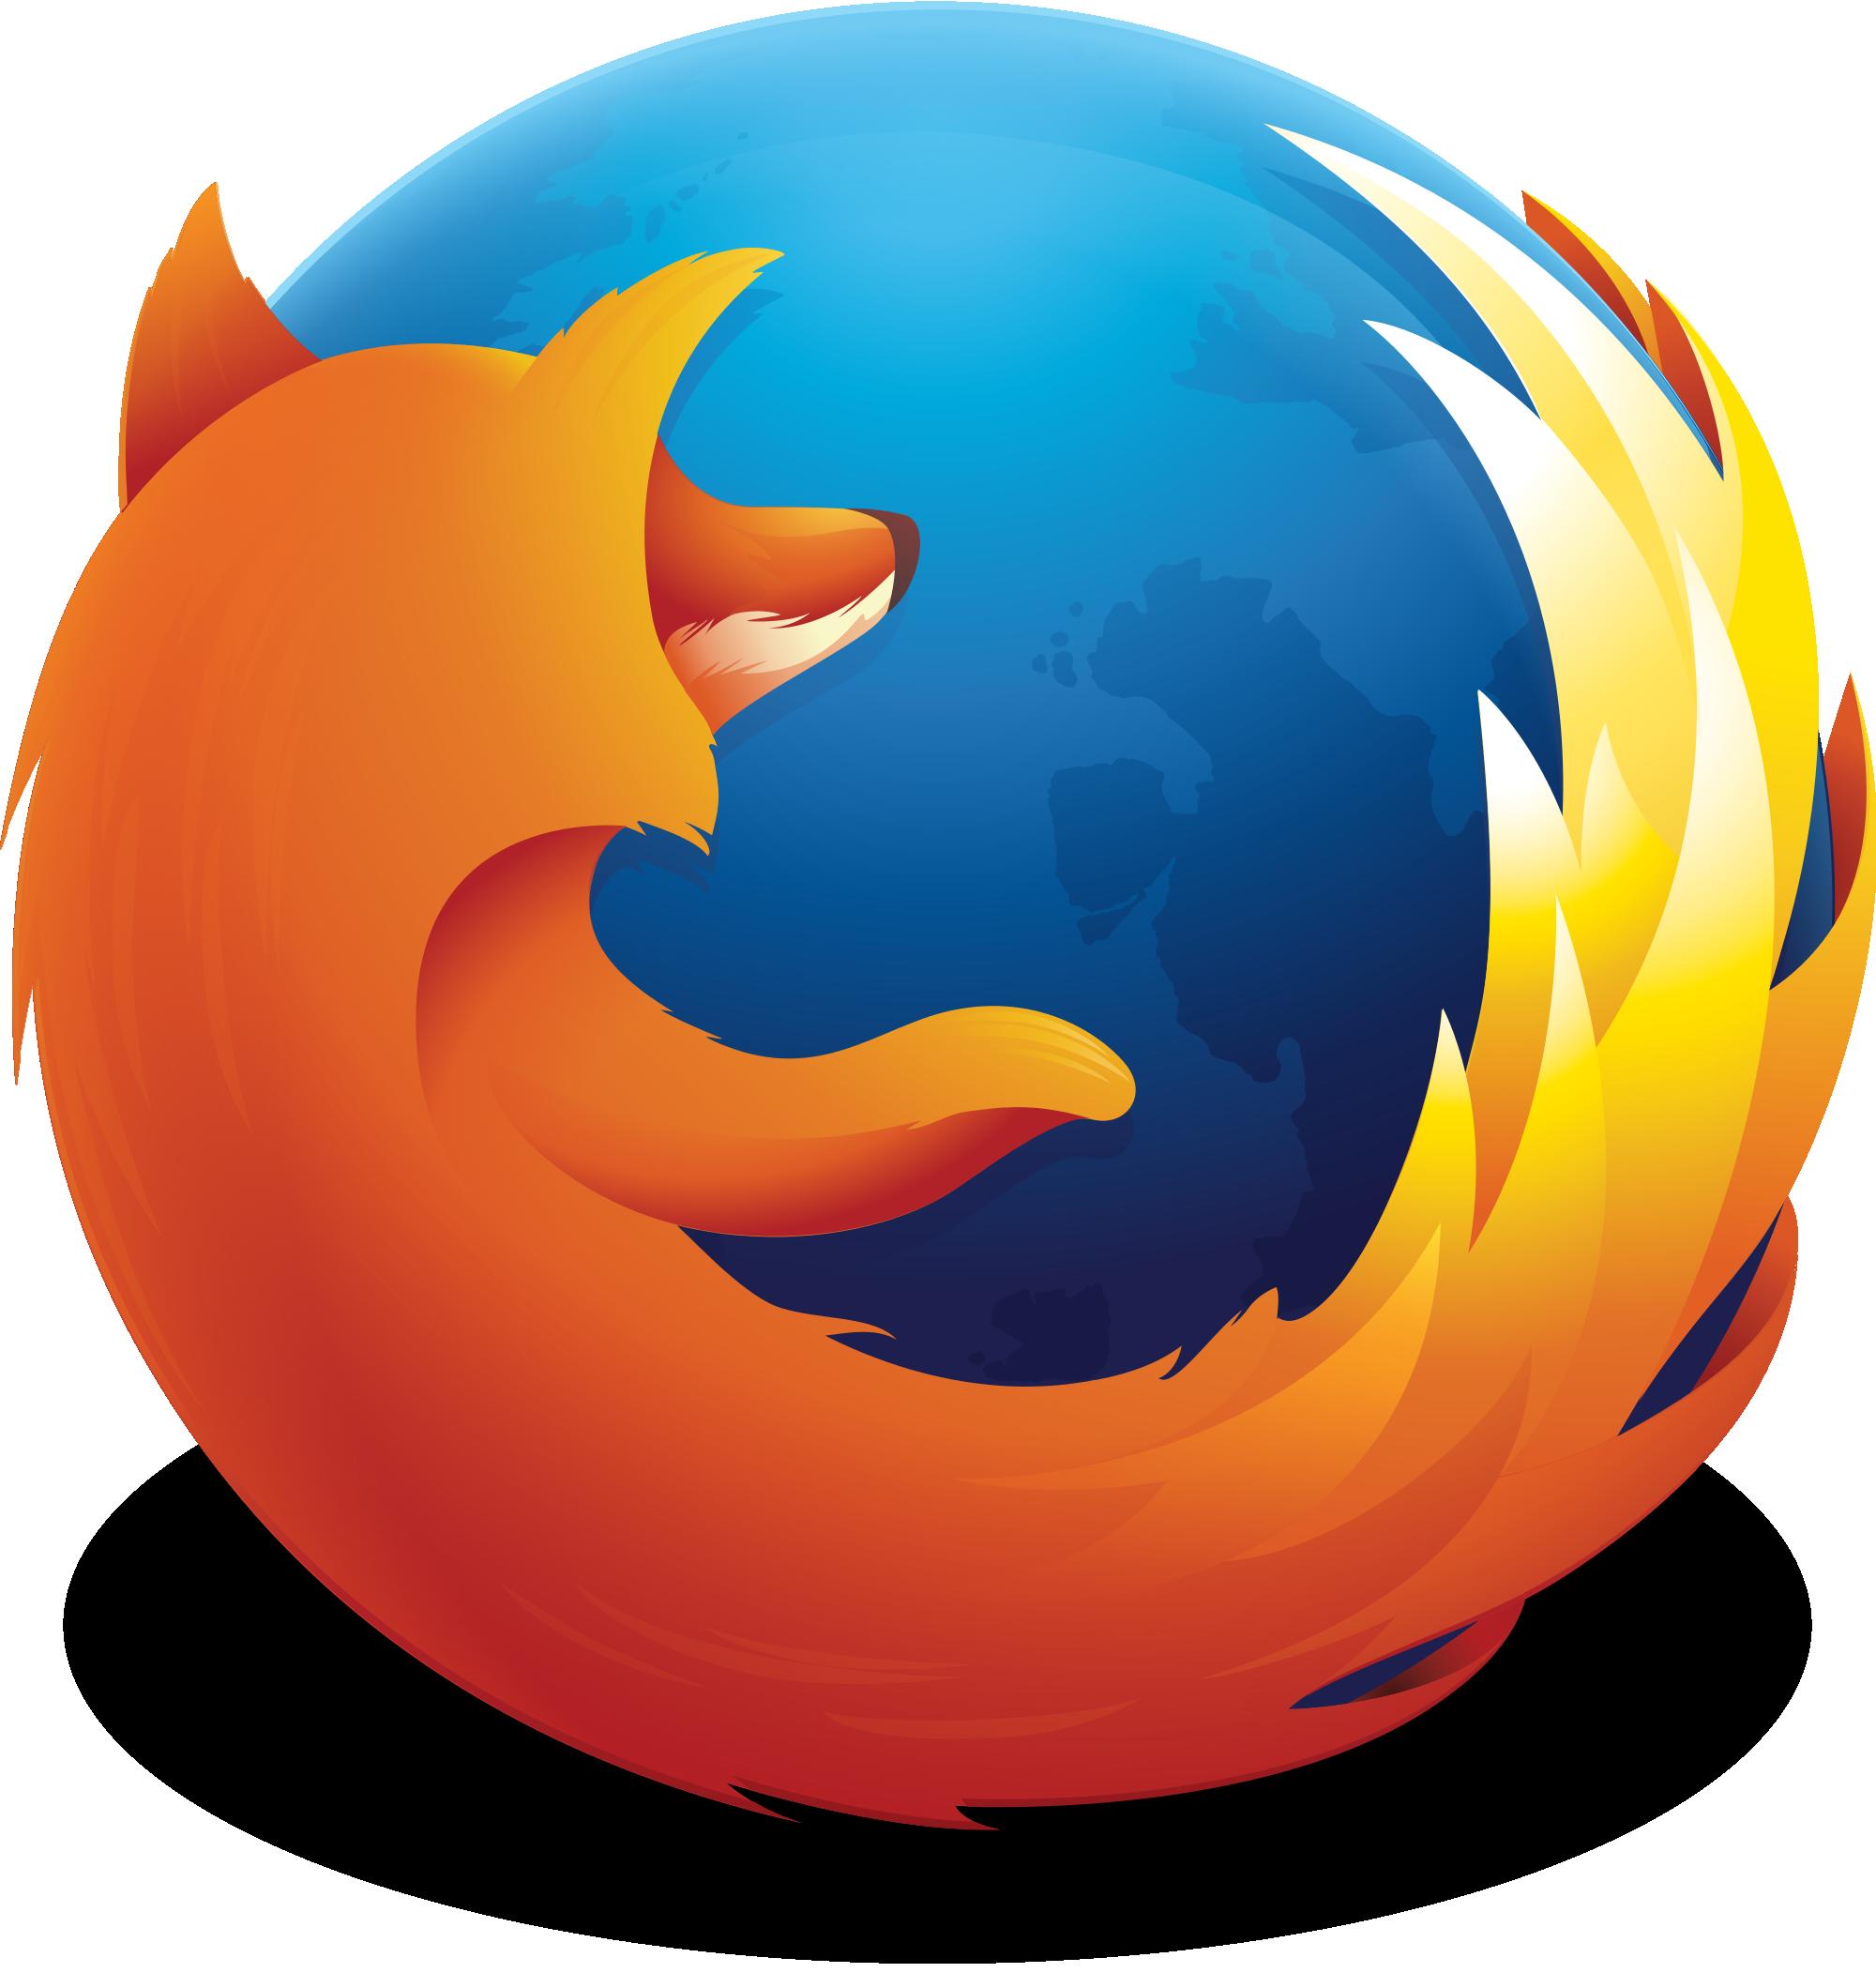 General 2000x2119 Mozilla Firefox logo internet network Browser